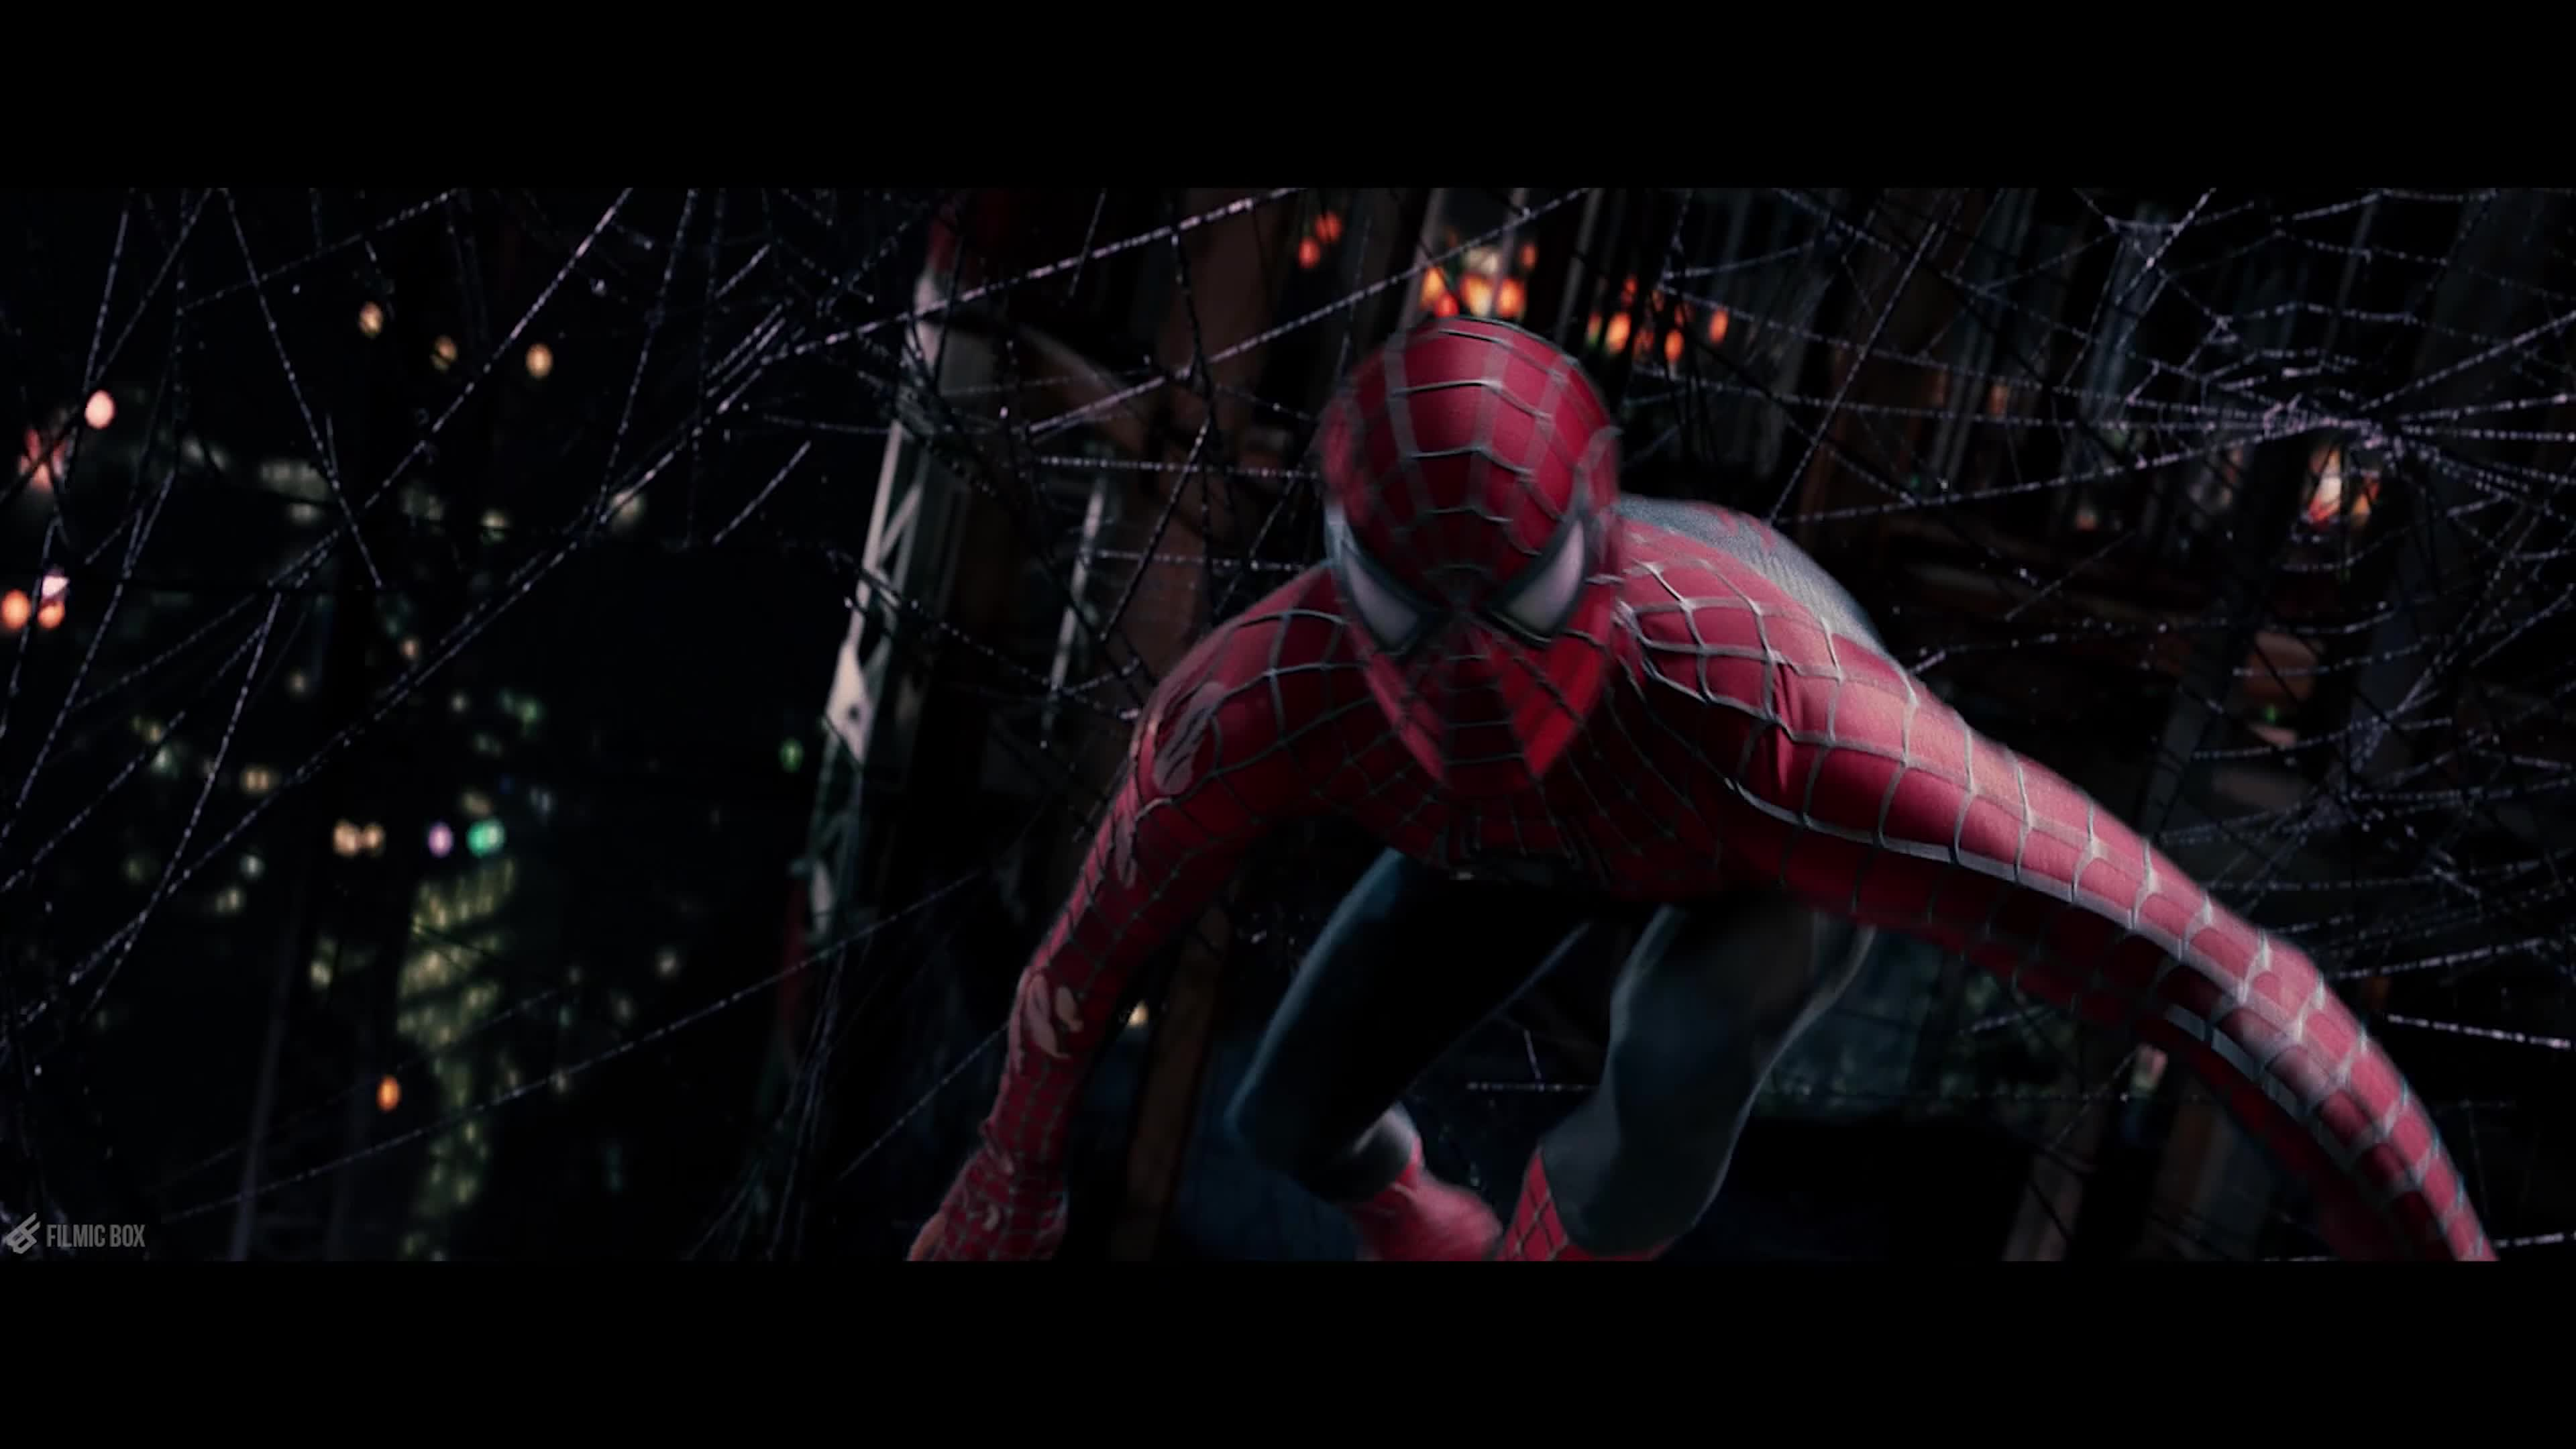 spider-man & new goblin vs venom & sandman (part 1) | spider-man 3